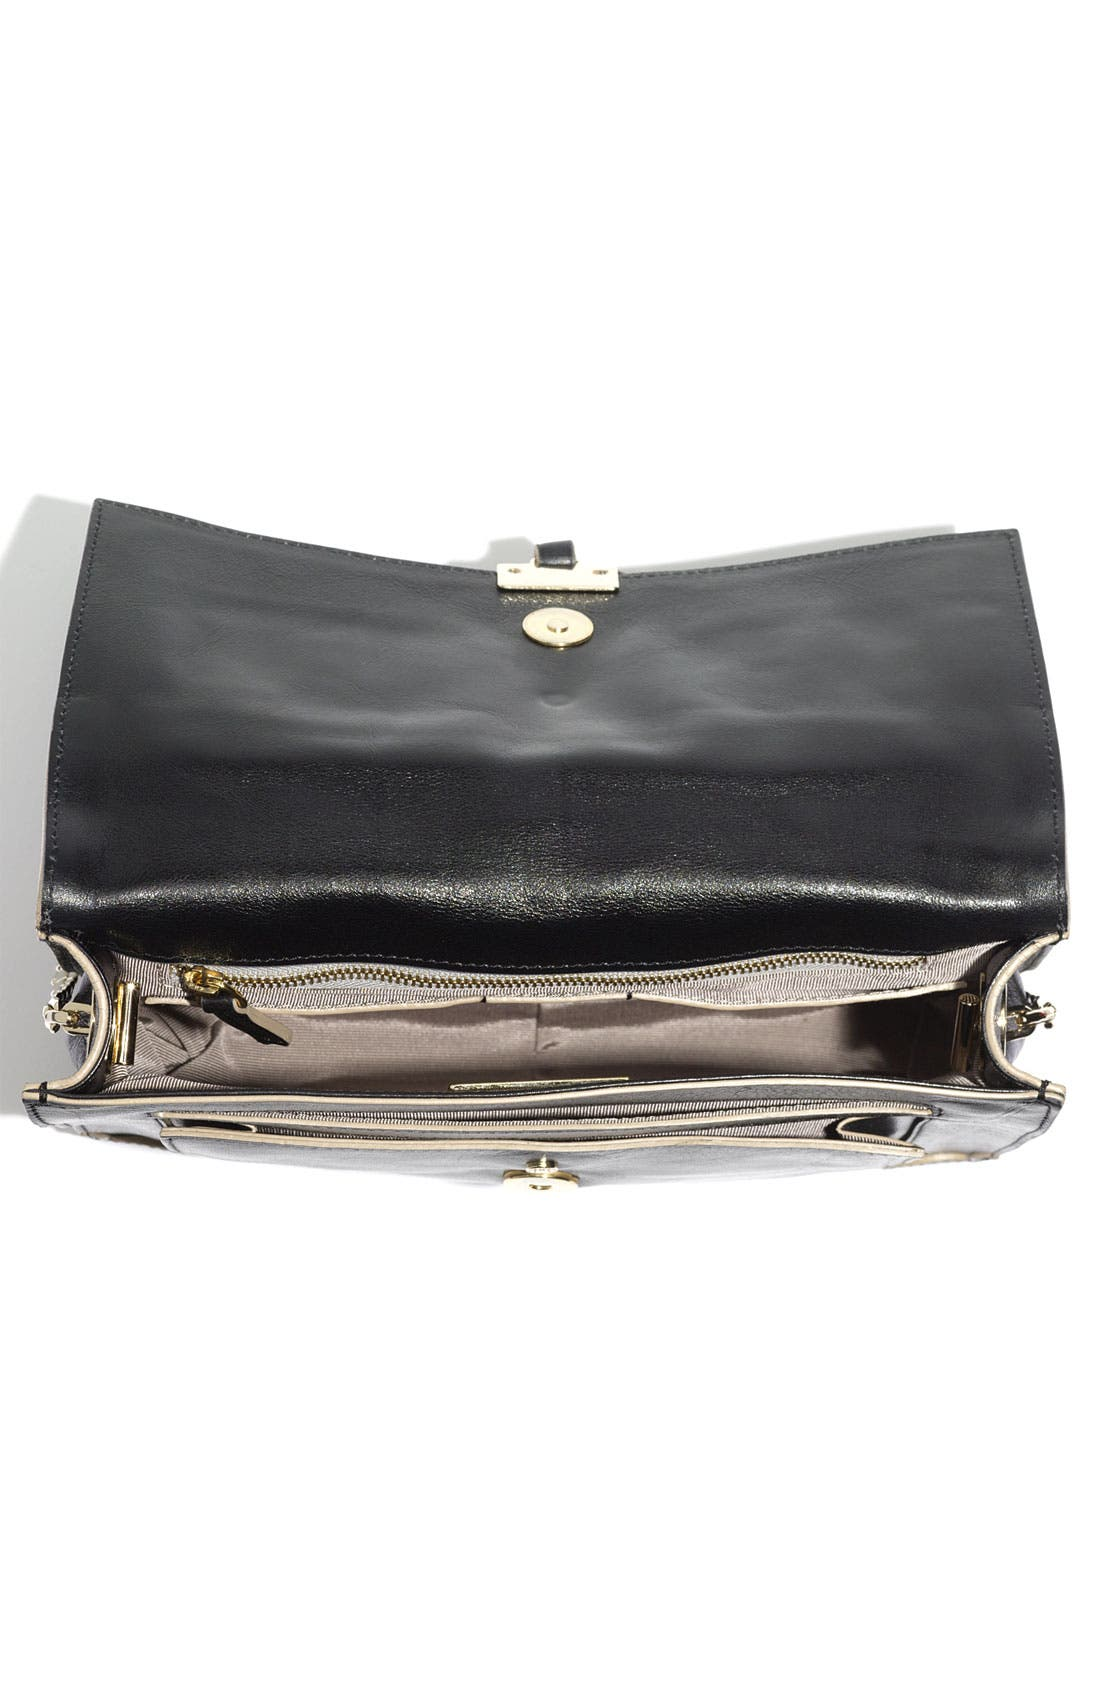 ,                             Jason Wu 'Jourdan' Calfskin Leather Shoulder Bag,                             Alternate thumbnail 2, color,                             001